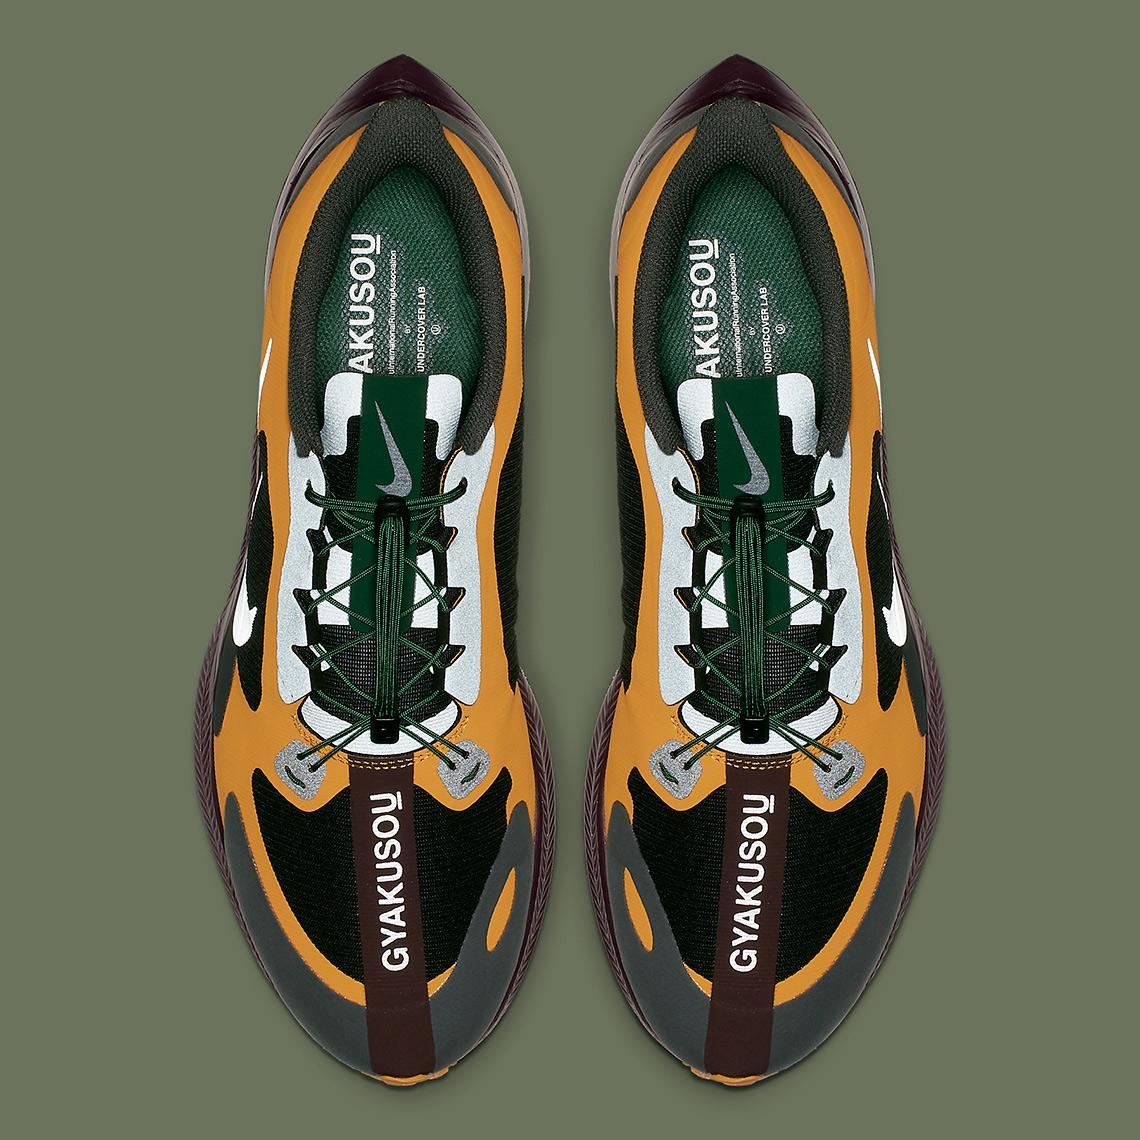 216551a904ad2 ... Nike Zoom Pegasus 35 Turbo Release Date  February 28th